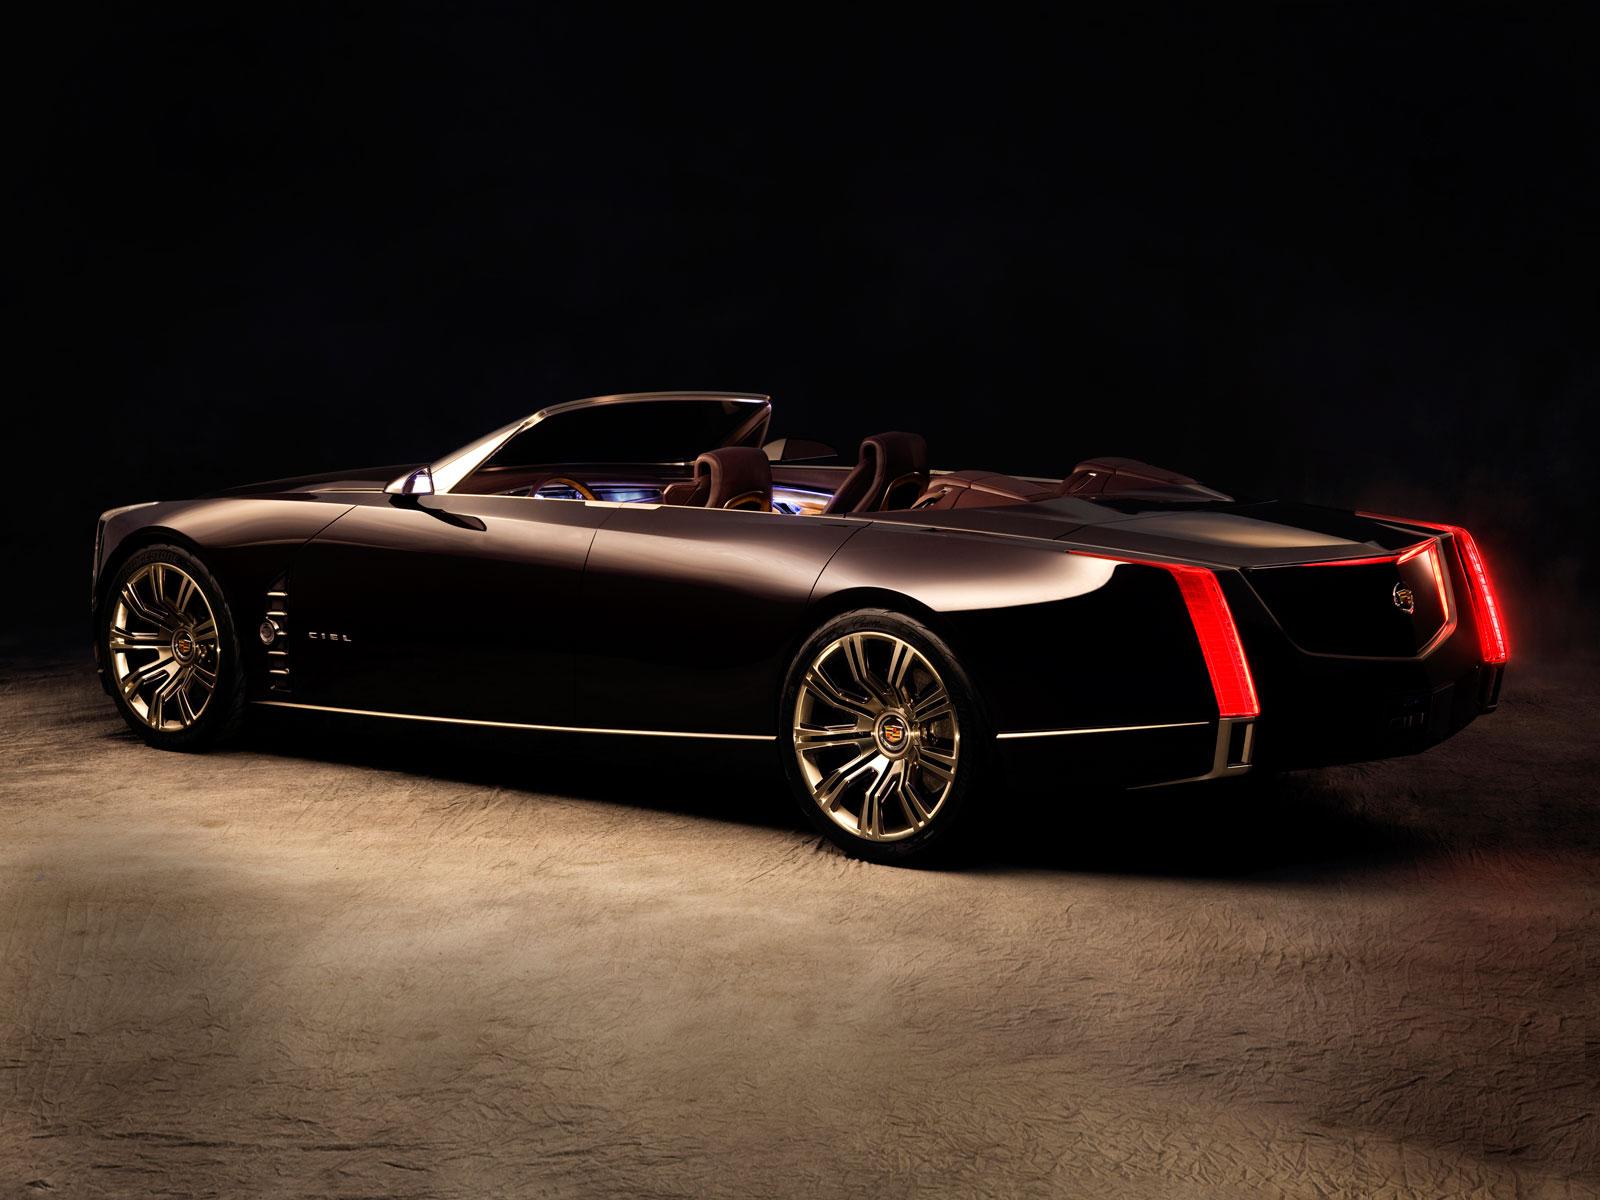 Cadillac Ciel, 2011